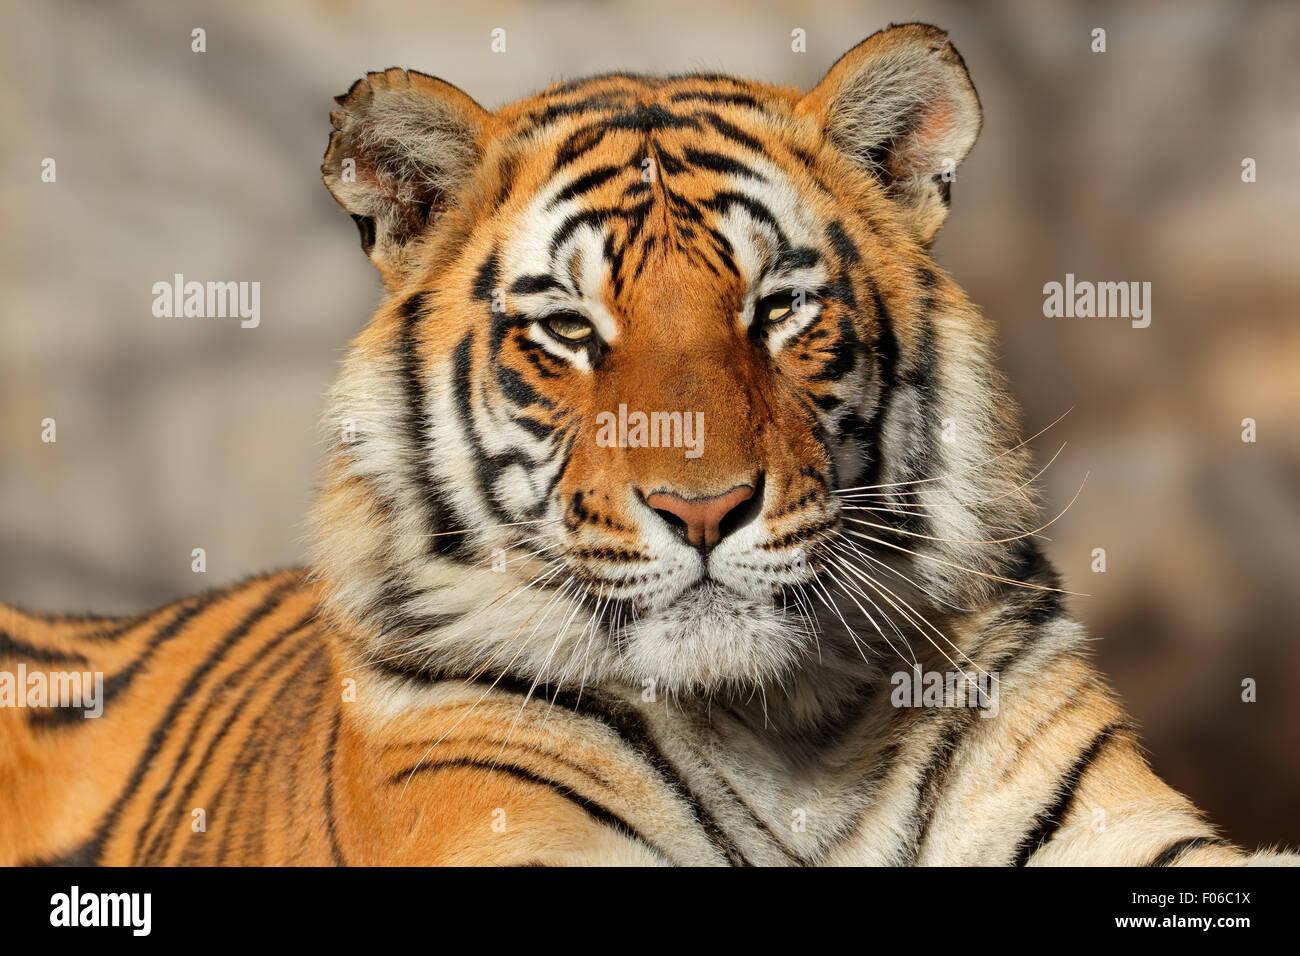 Retrato de un tigre de Bengala (Panthera tigris bengalensis) Imagen De Stock